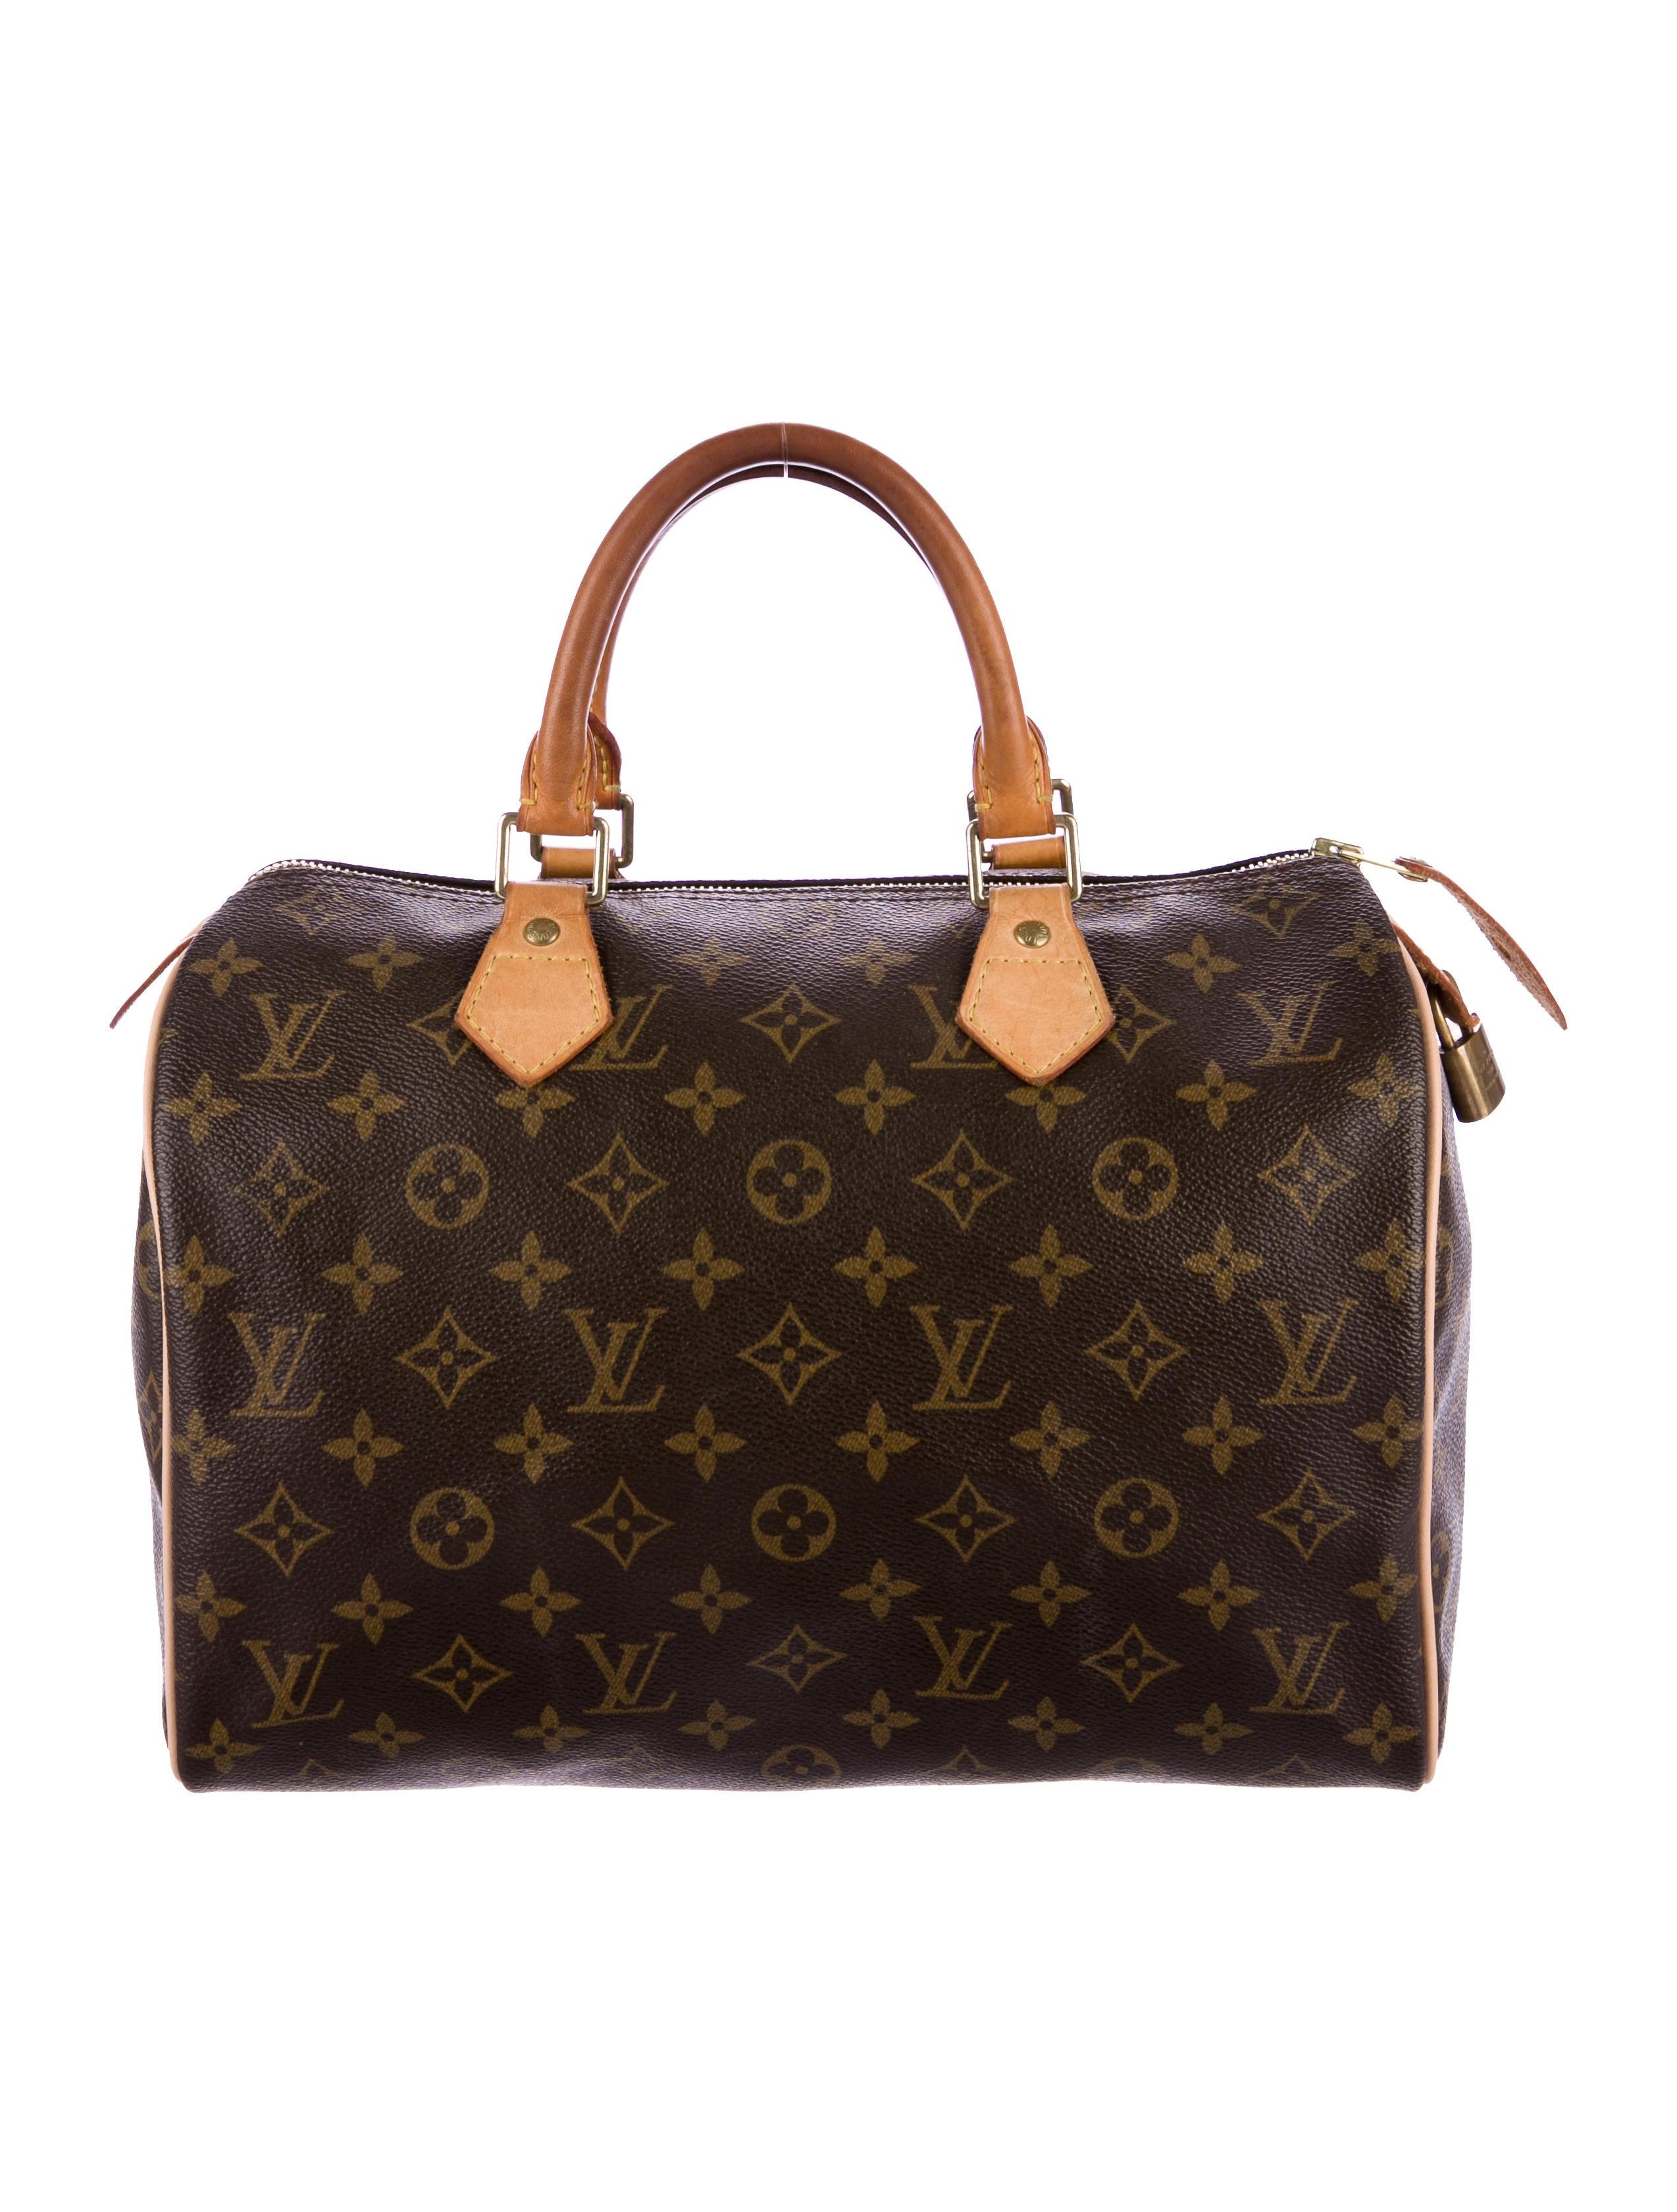 Louis vuitton monogram speedy 35 handbags lou138176 for Louis vuitton miroir speedy 35